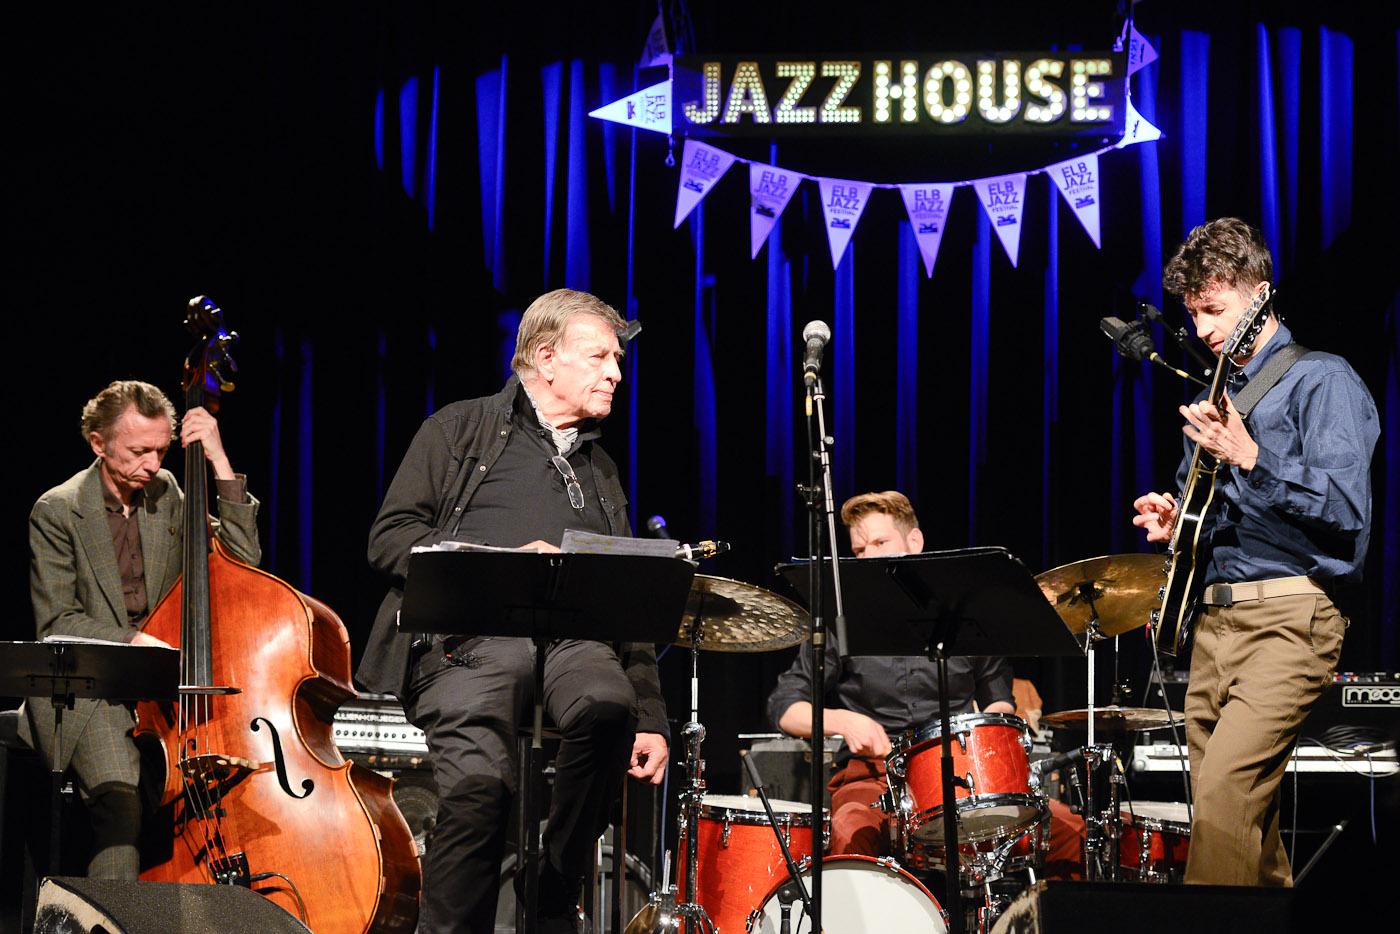 Foto ID 15092208 Music: Rolf Kühn Unit, Jazzhouse, Niels Hemmingsens Gade 10